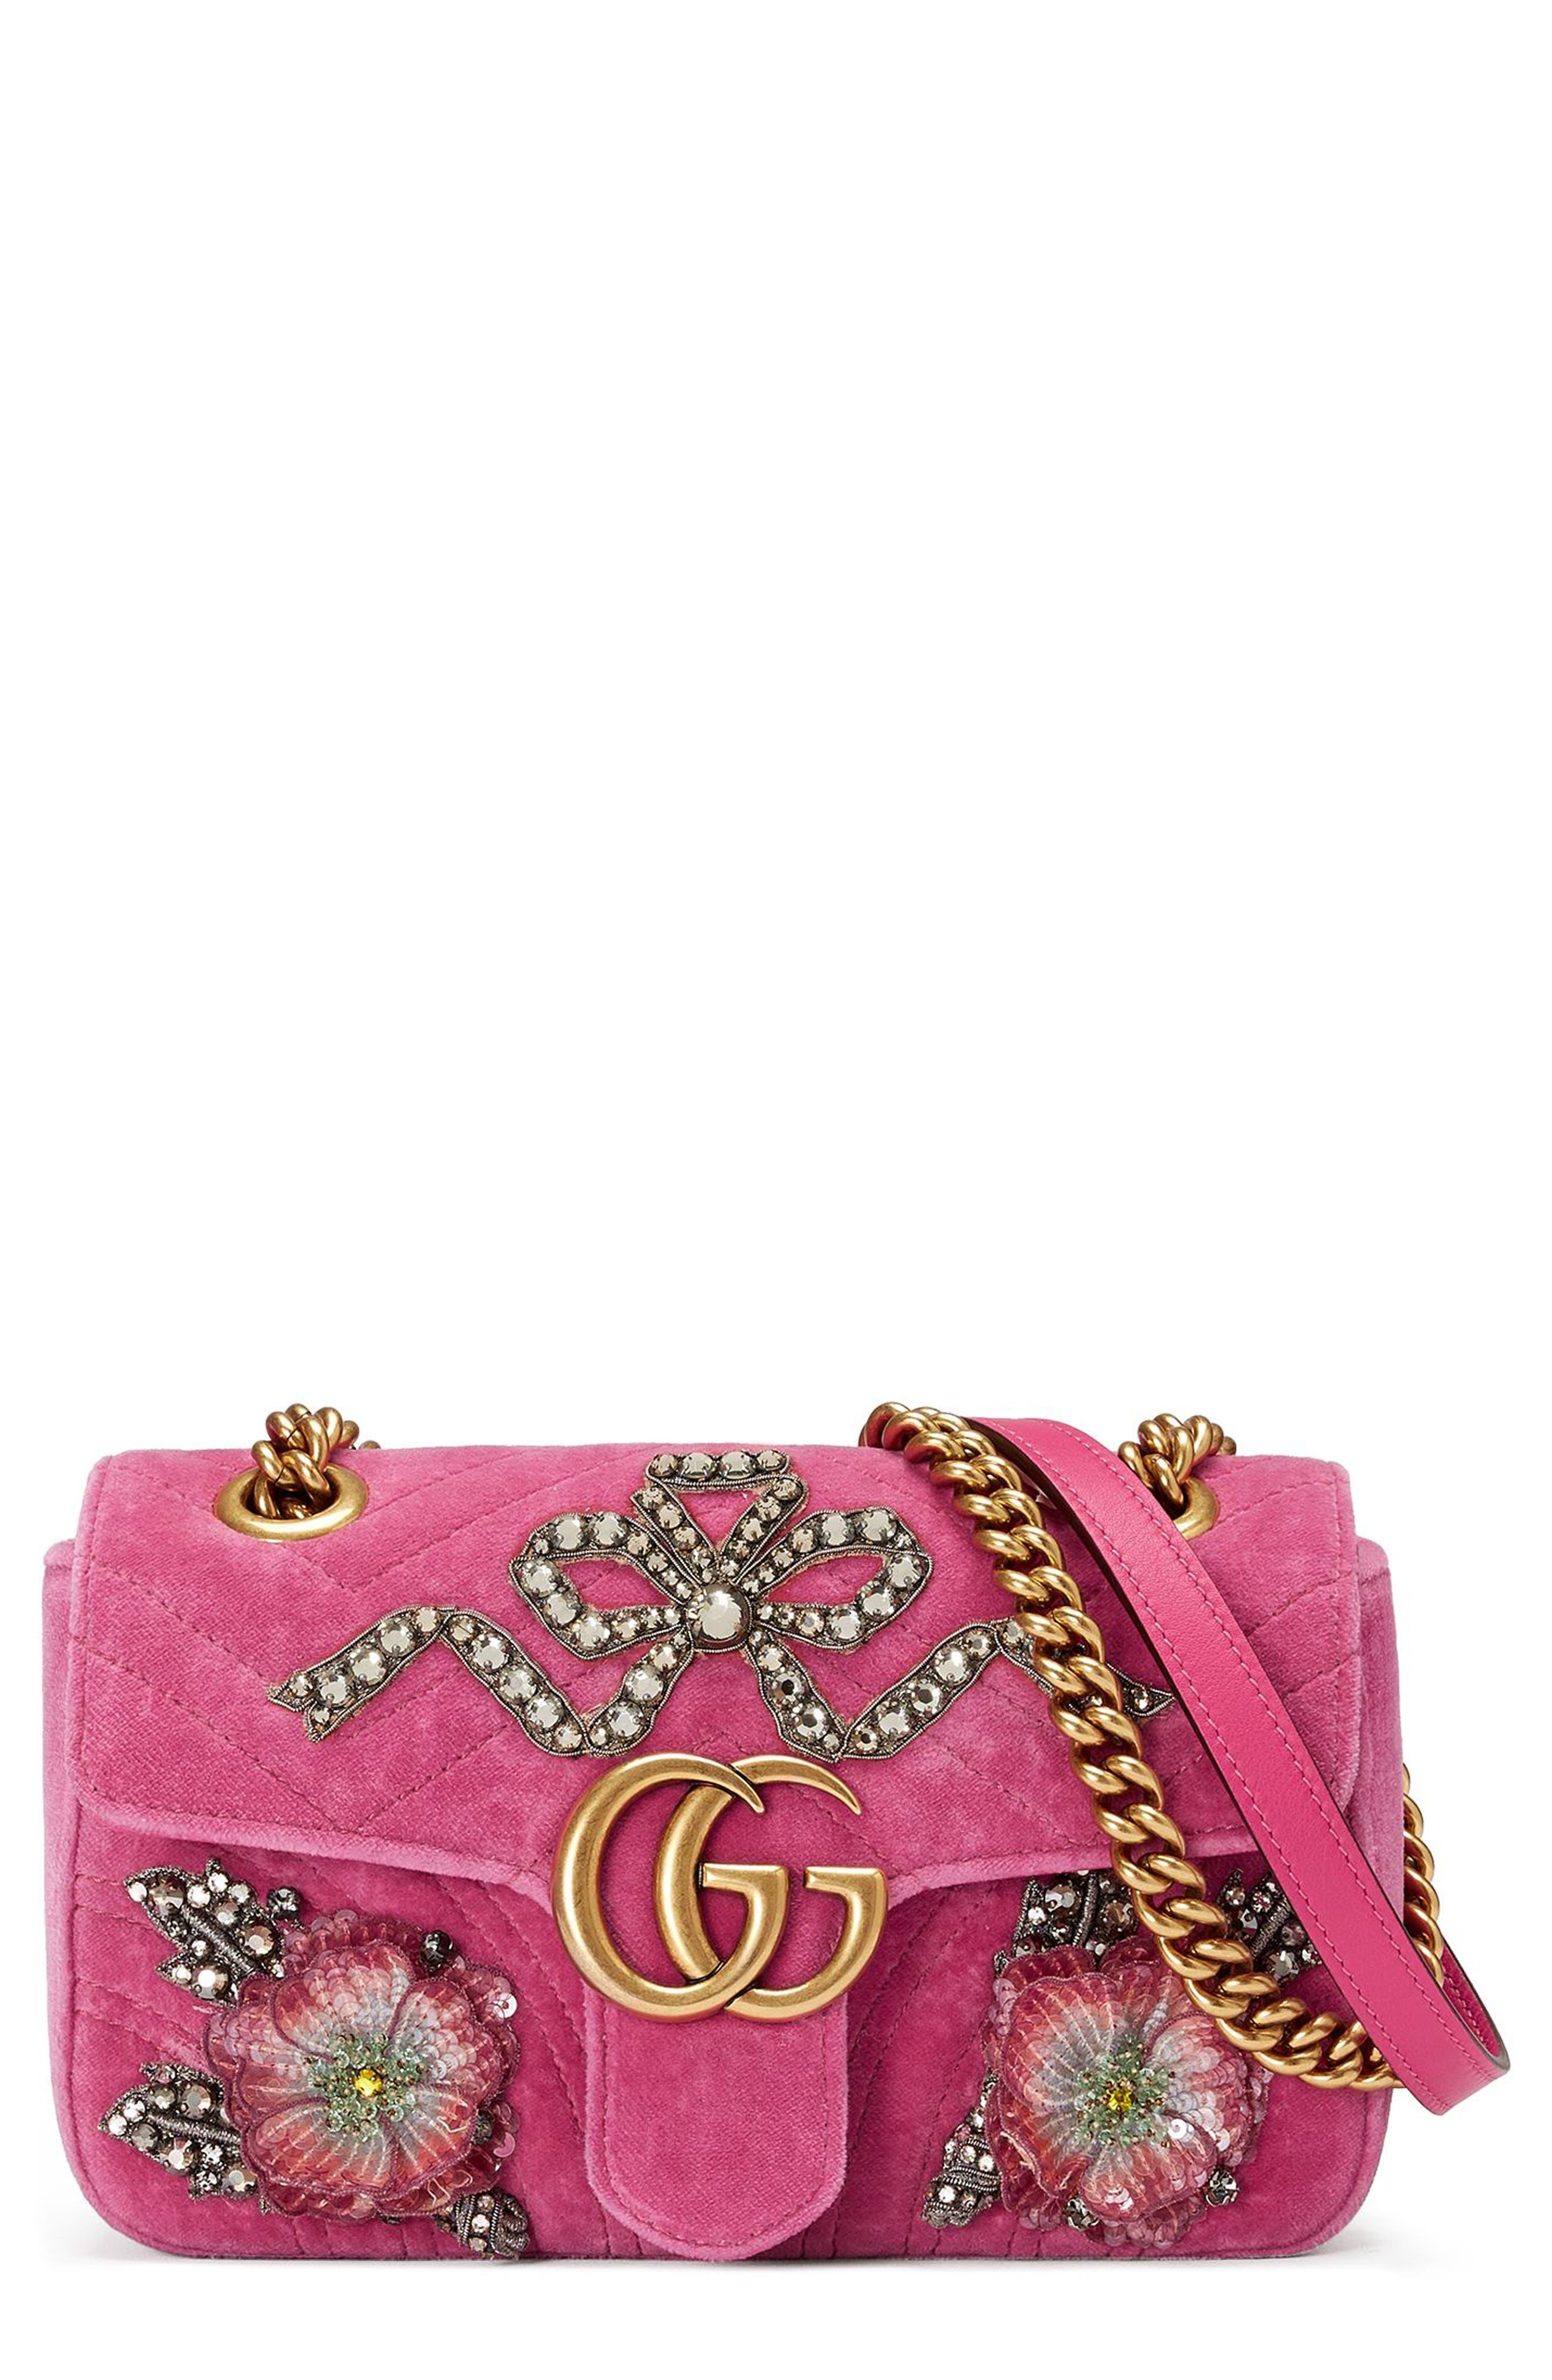 Mini GG Marmont Matelassé Velvet Shoulder Bag,                             Main thumbnail 1, color,                             Raspberry